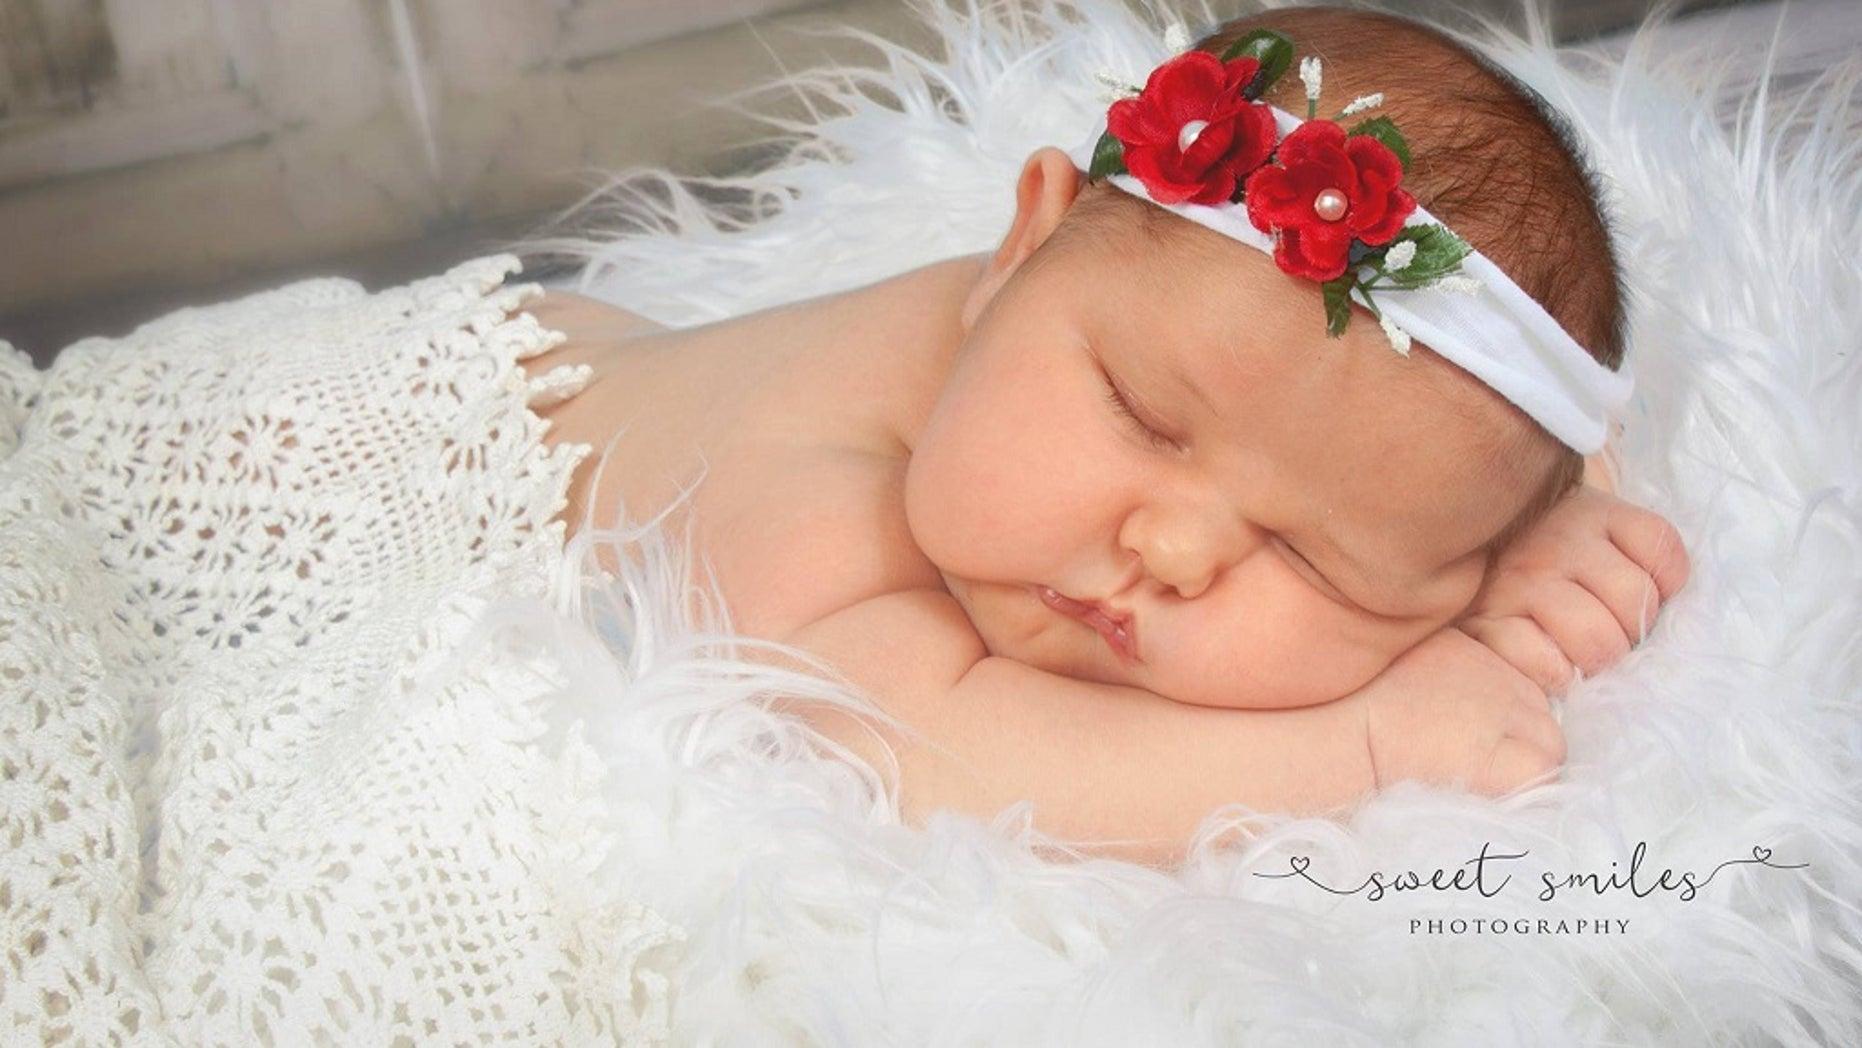 Baby Carleigh Brooke Corbitt was 13 pounds, 5 ounces when she was born May 15 at Orange Park Medical Center in Florida.